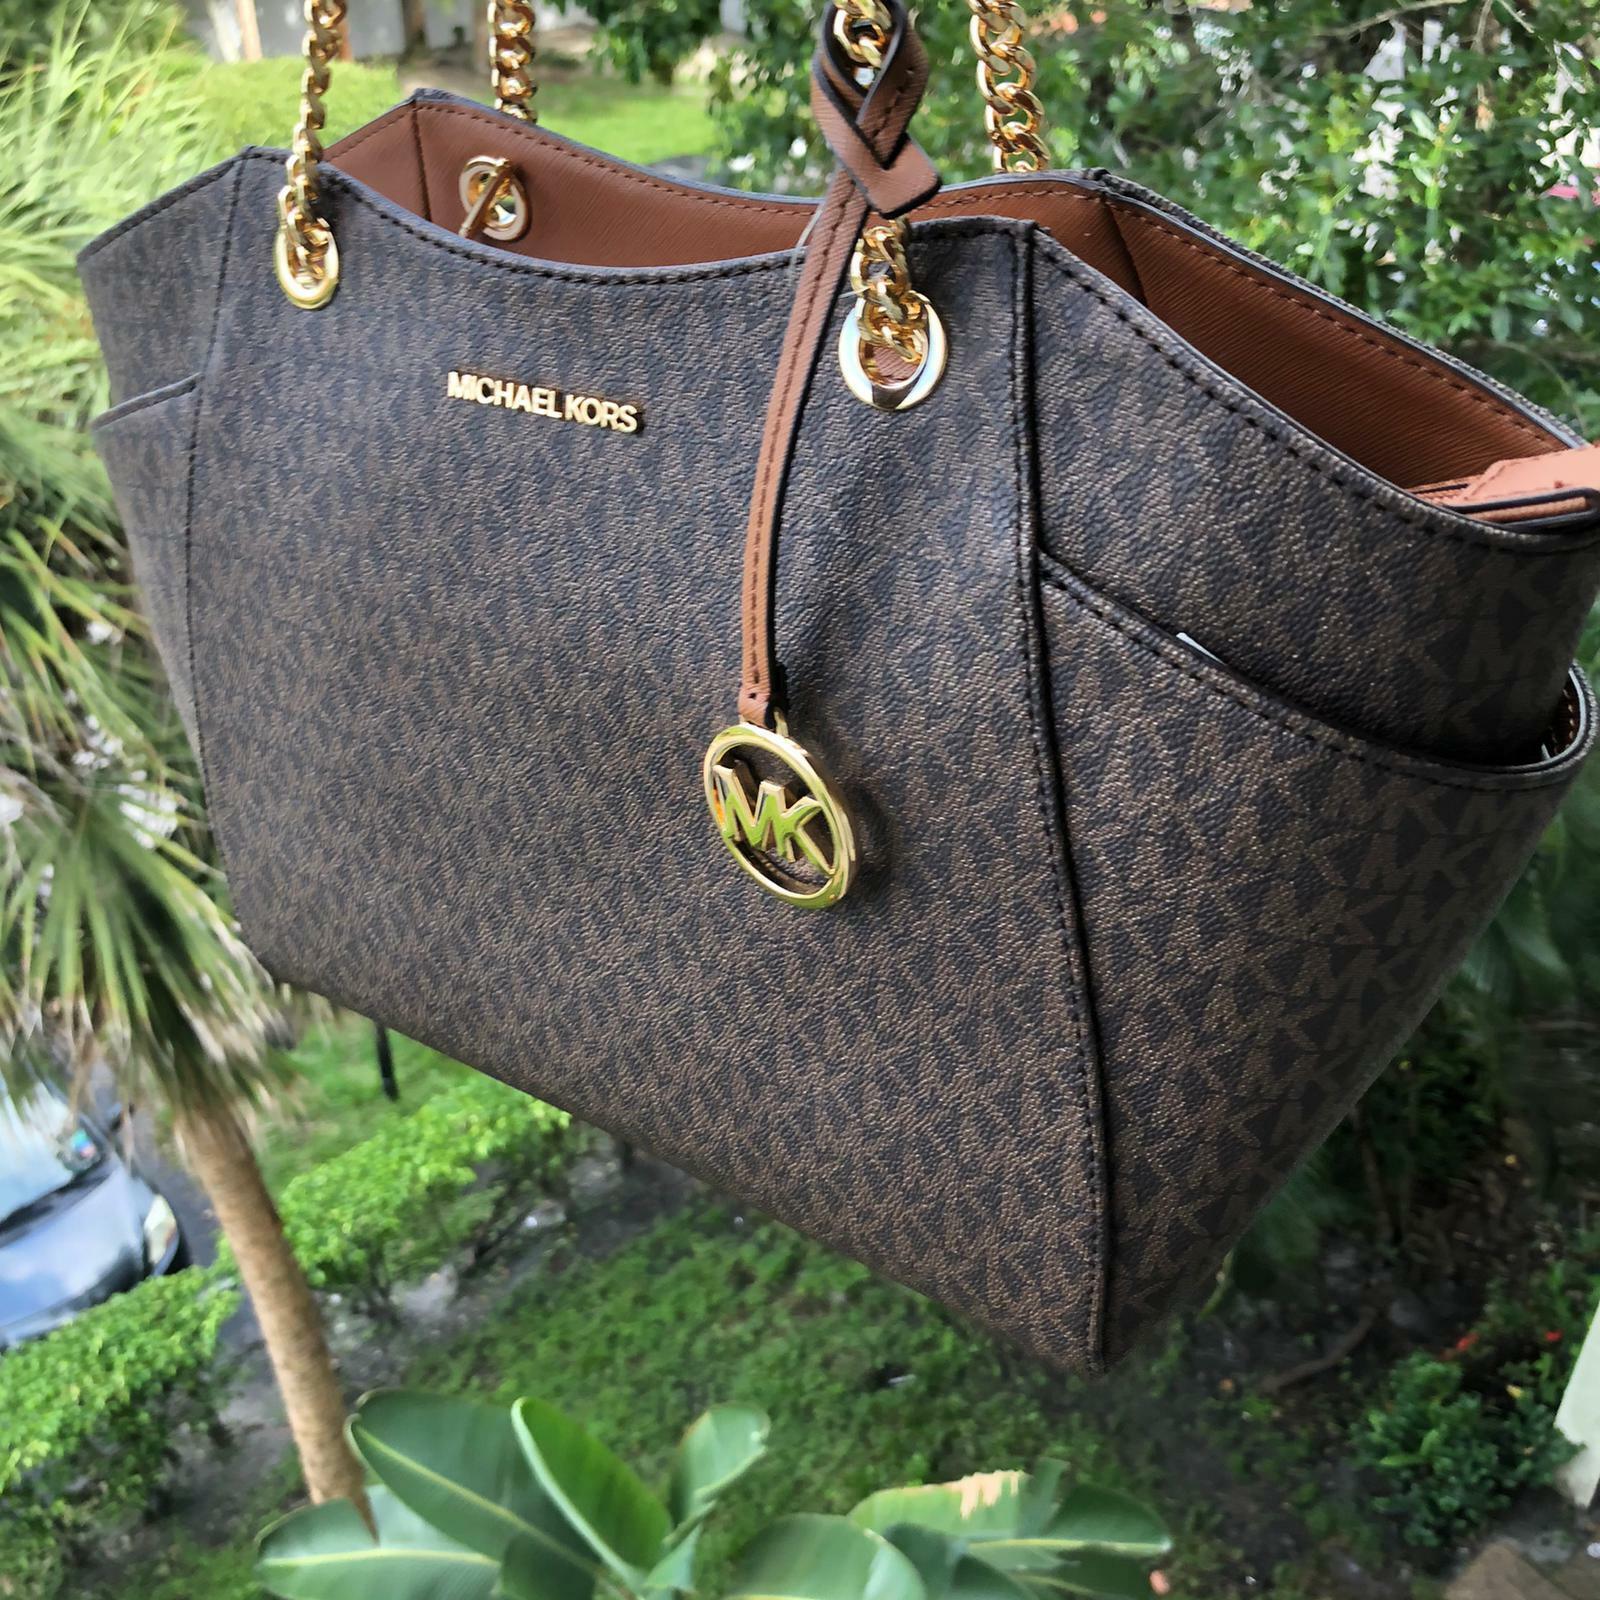 Michael Kors Women PVC Leather Shoulder Chain Tote Handbag M